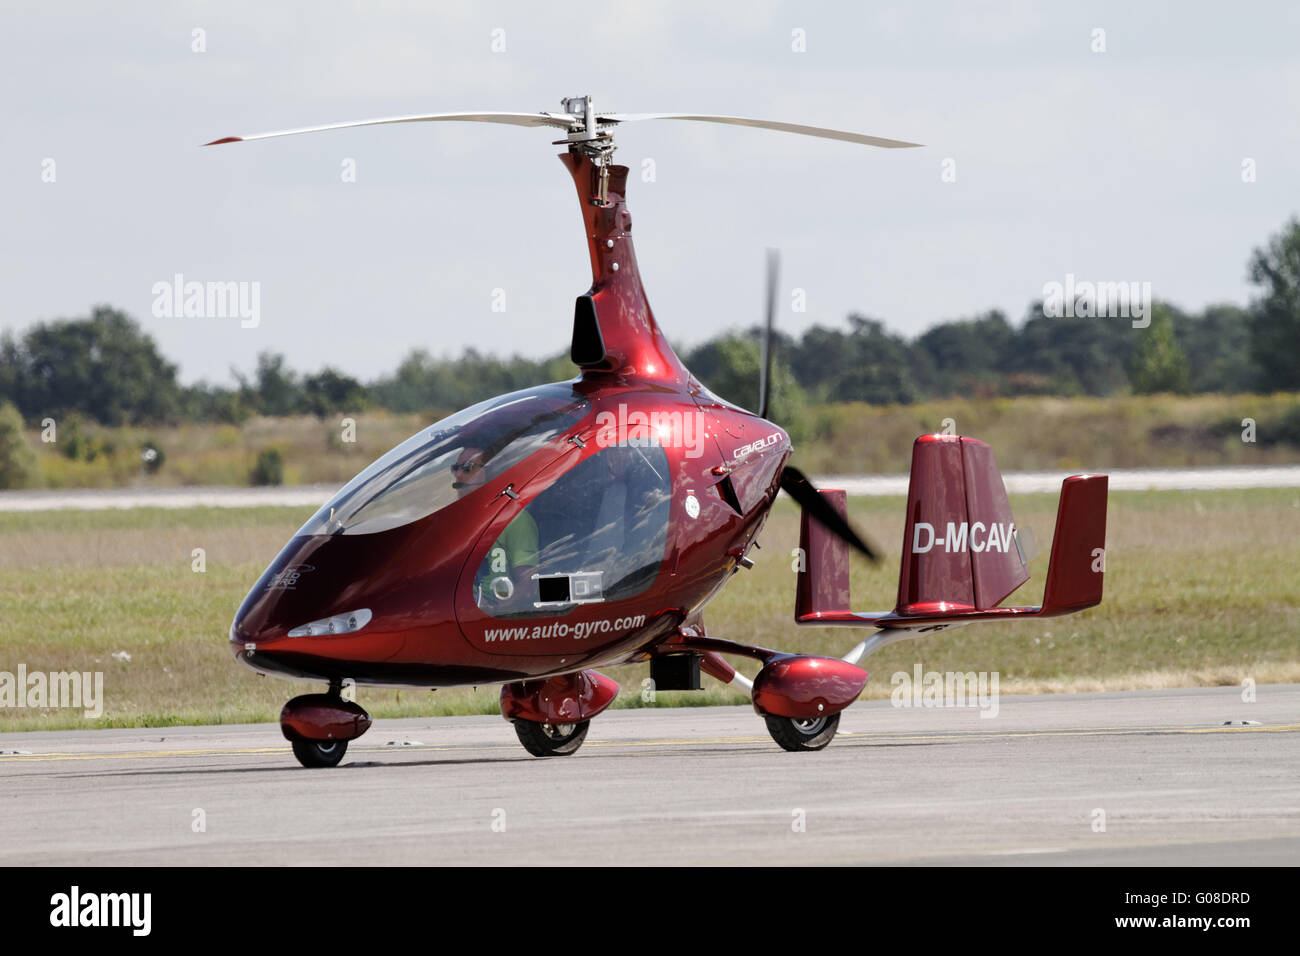 Autogyro Gmbh Stock Photos & Autogyro Gmbh Stock Images - Alamy